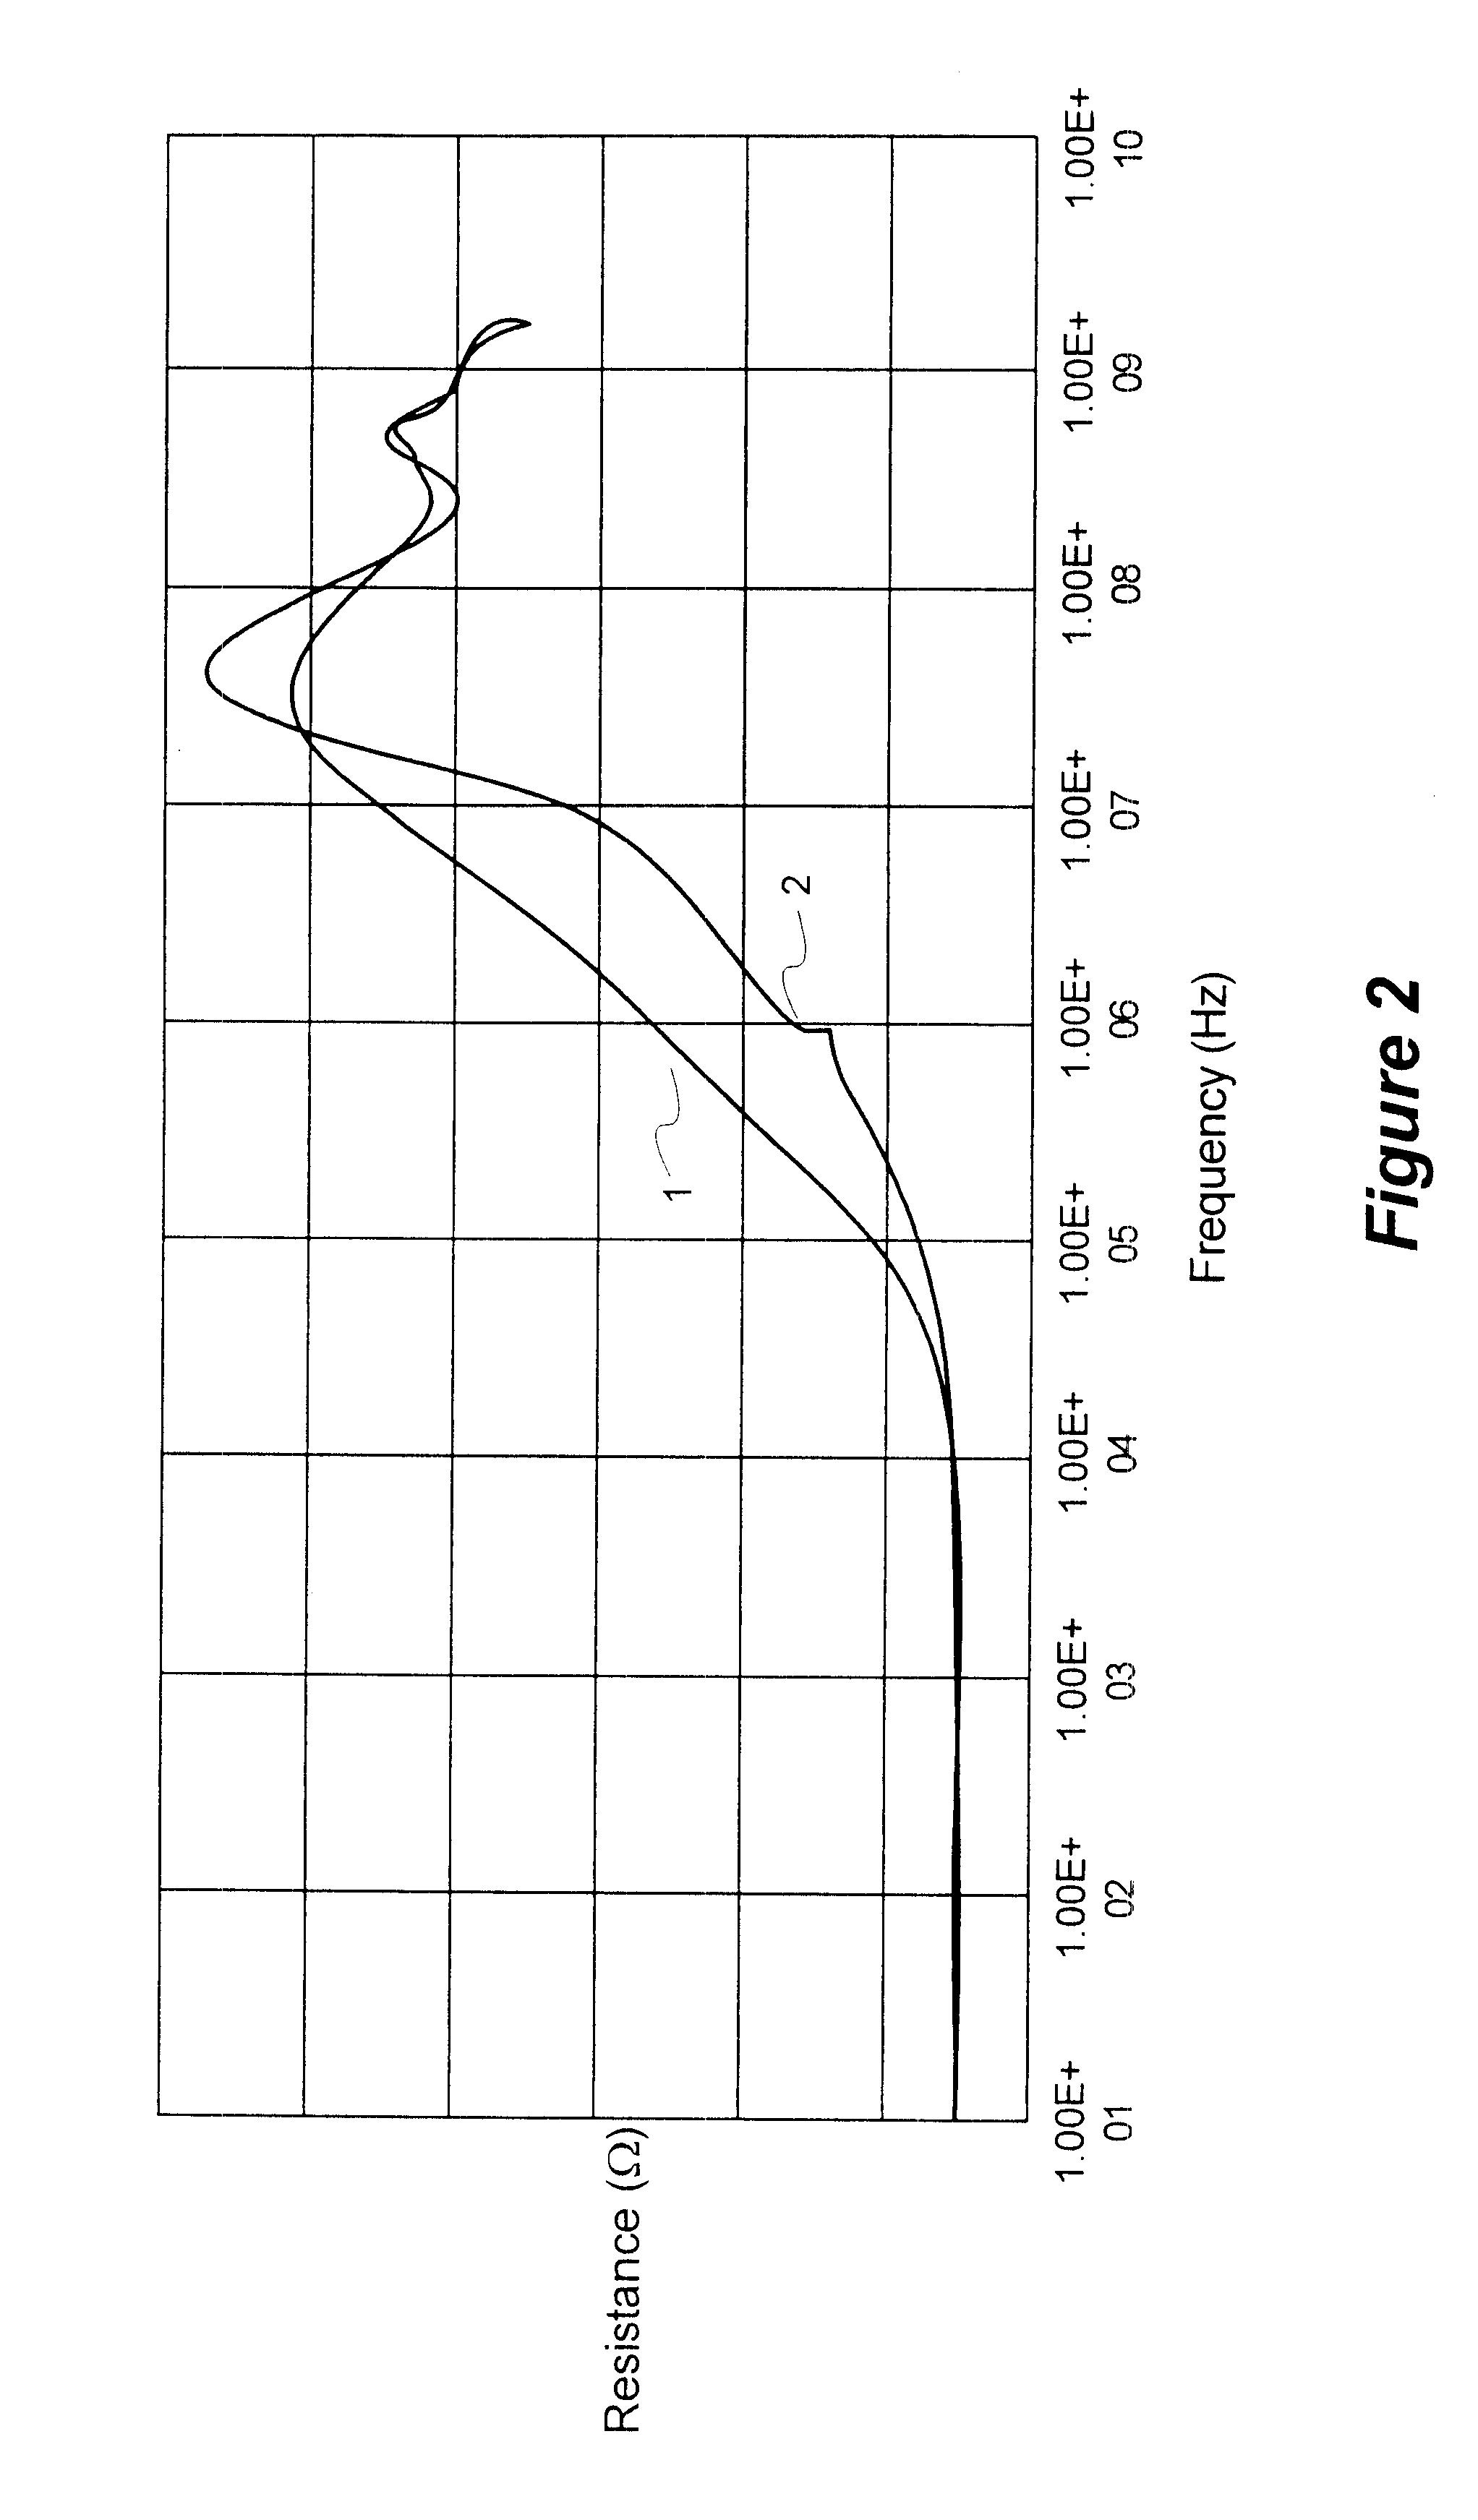 Patent Us 6572672 B2 Bunn Hg Wiring Diagram Images